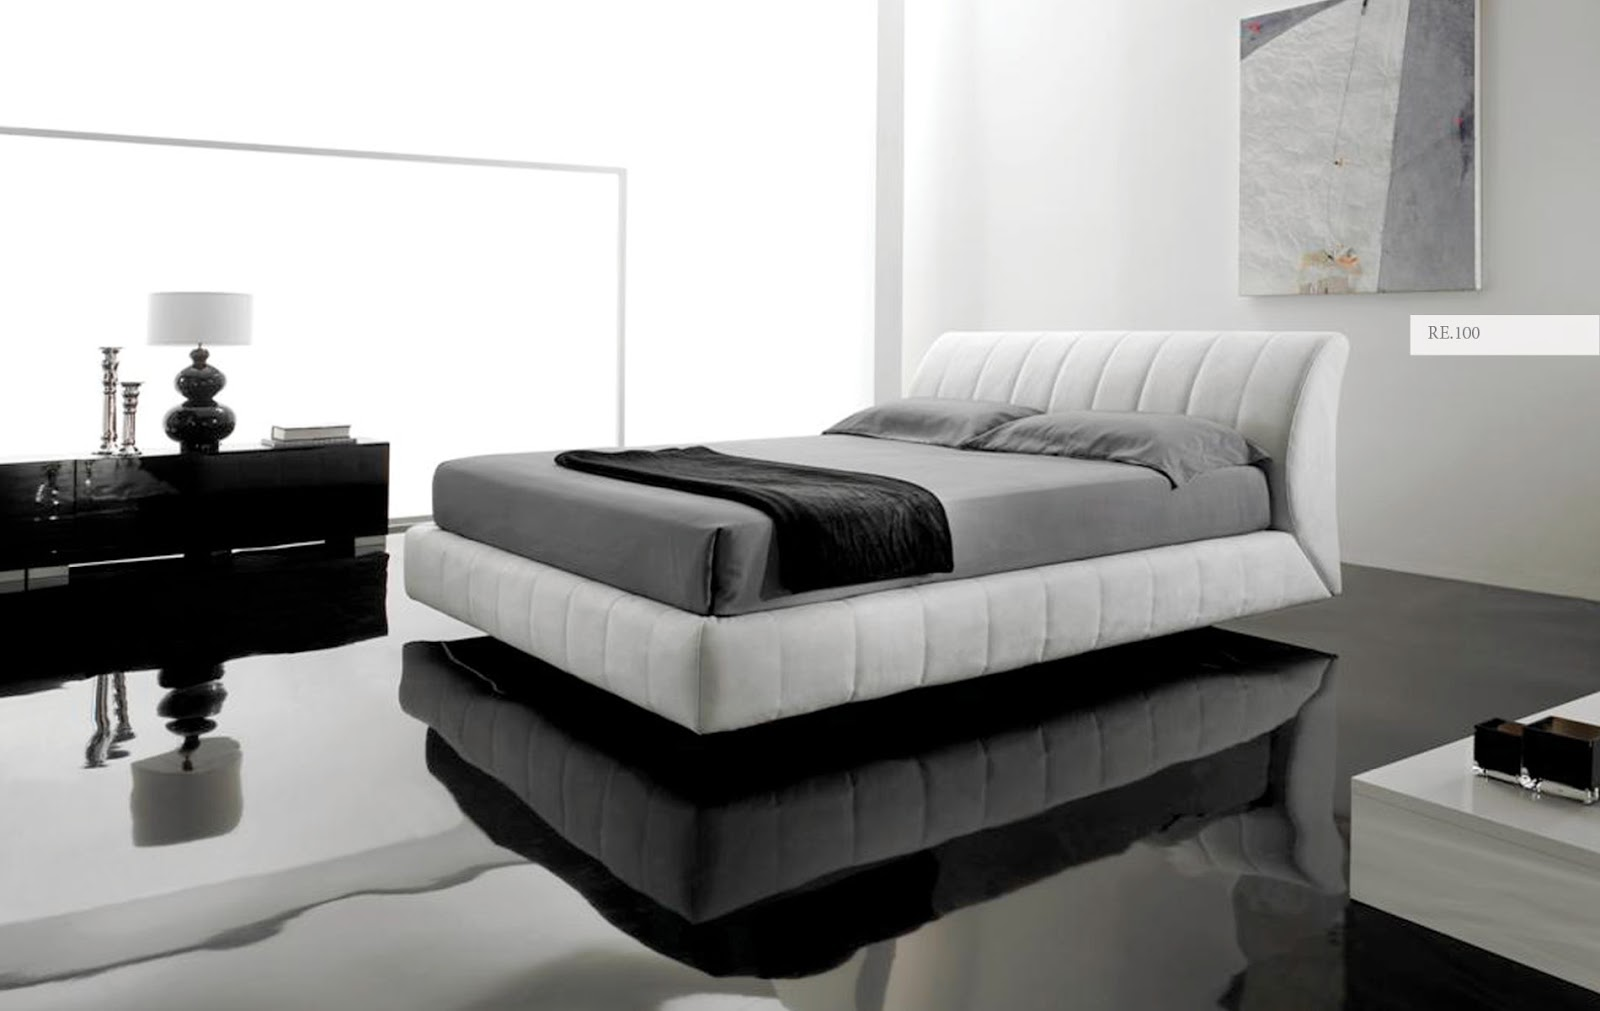 Bedroom Archives - Cavollone Italian Luxury Furniture in Houston